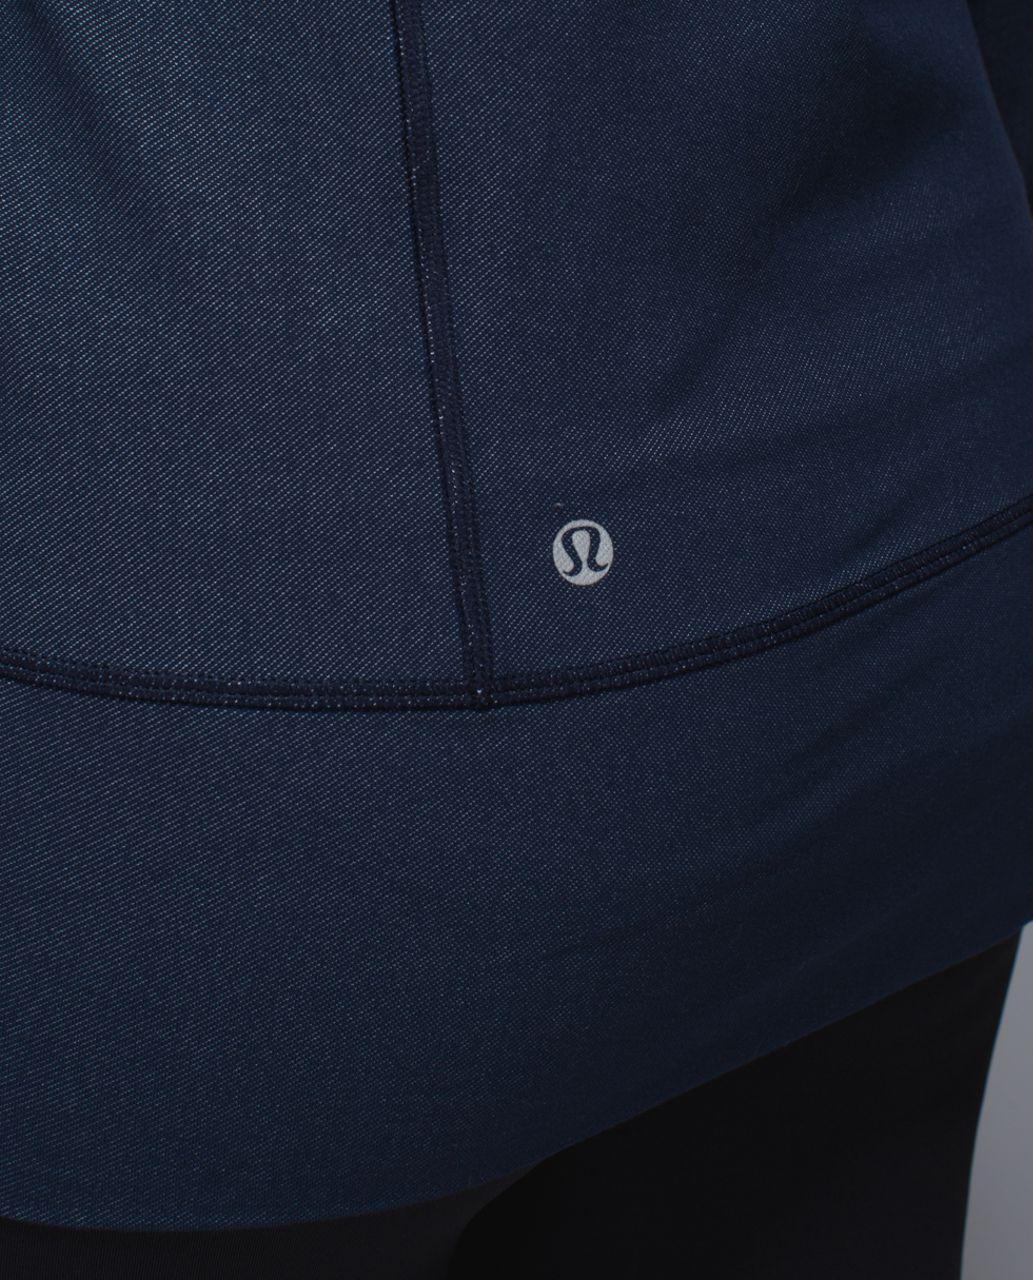 Lululemon Stride Jacket II - Inkwell